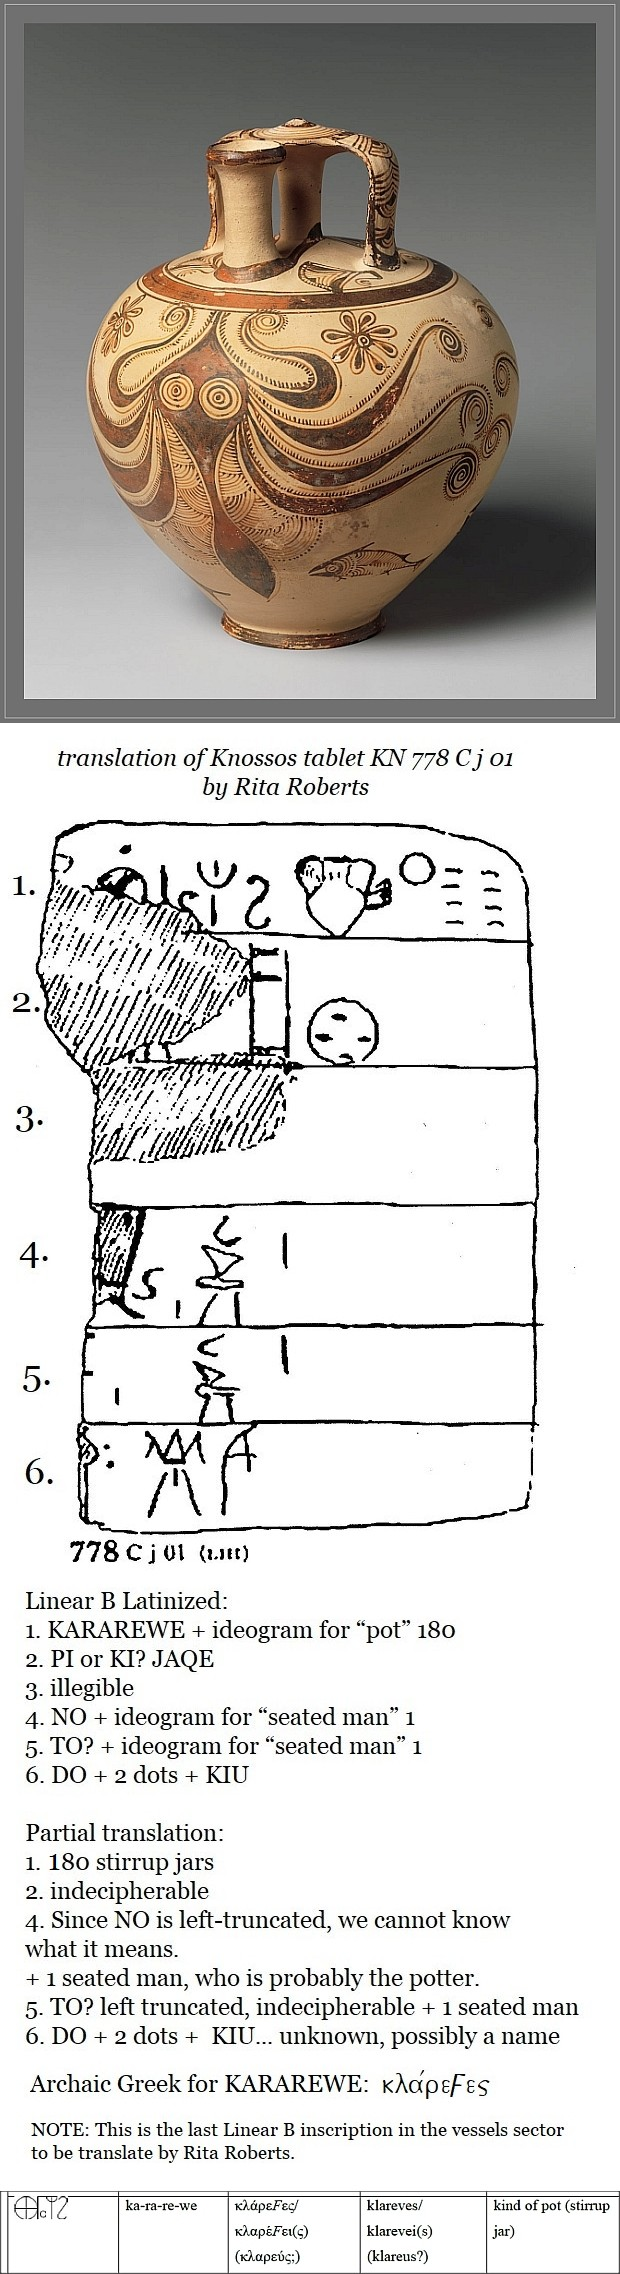 Knossos Linear B tablet KN 778 C j 01